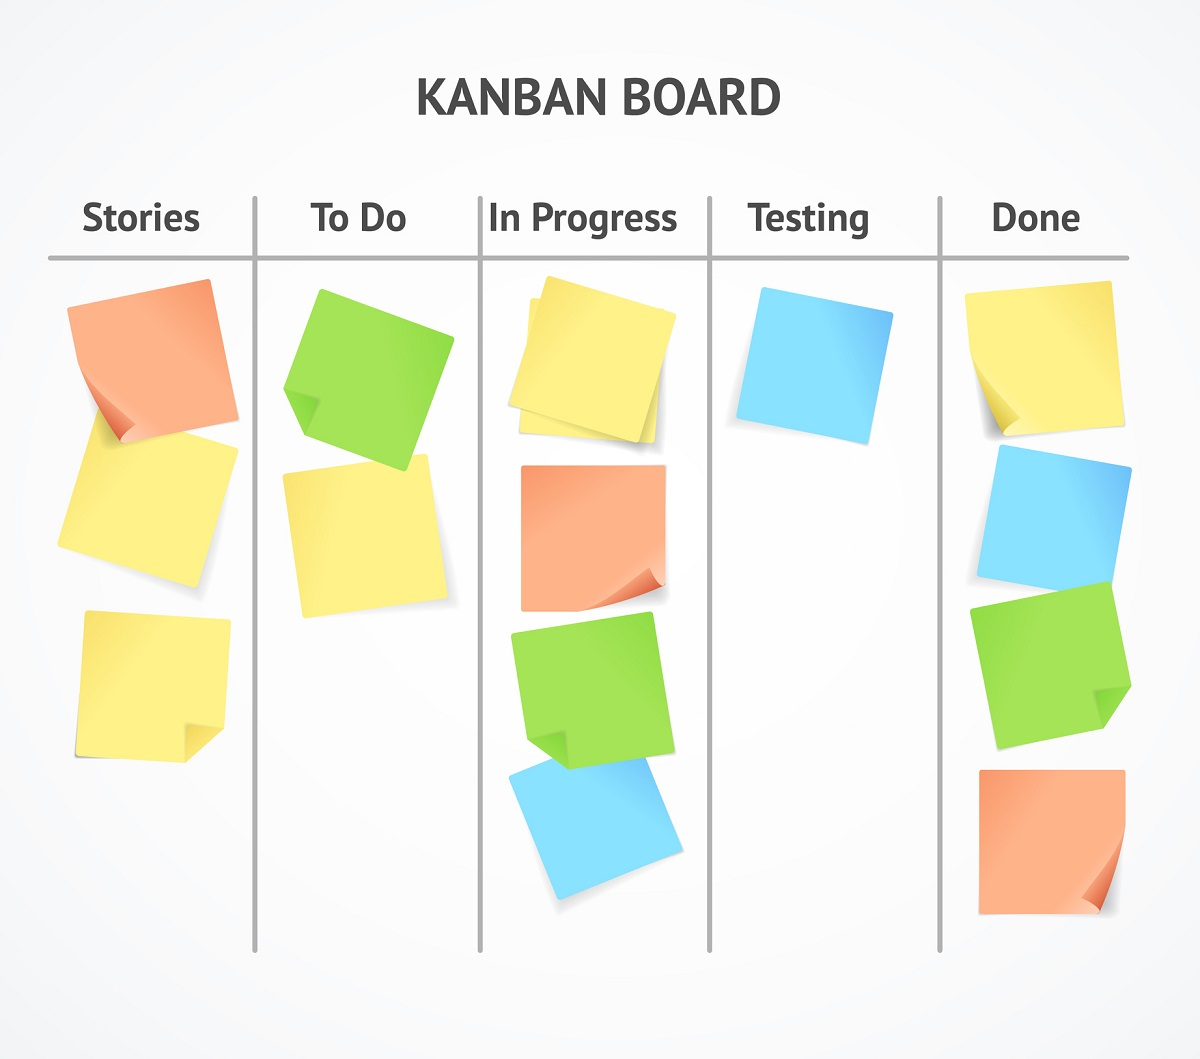 agile Verwaltung Kanban Bord